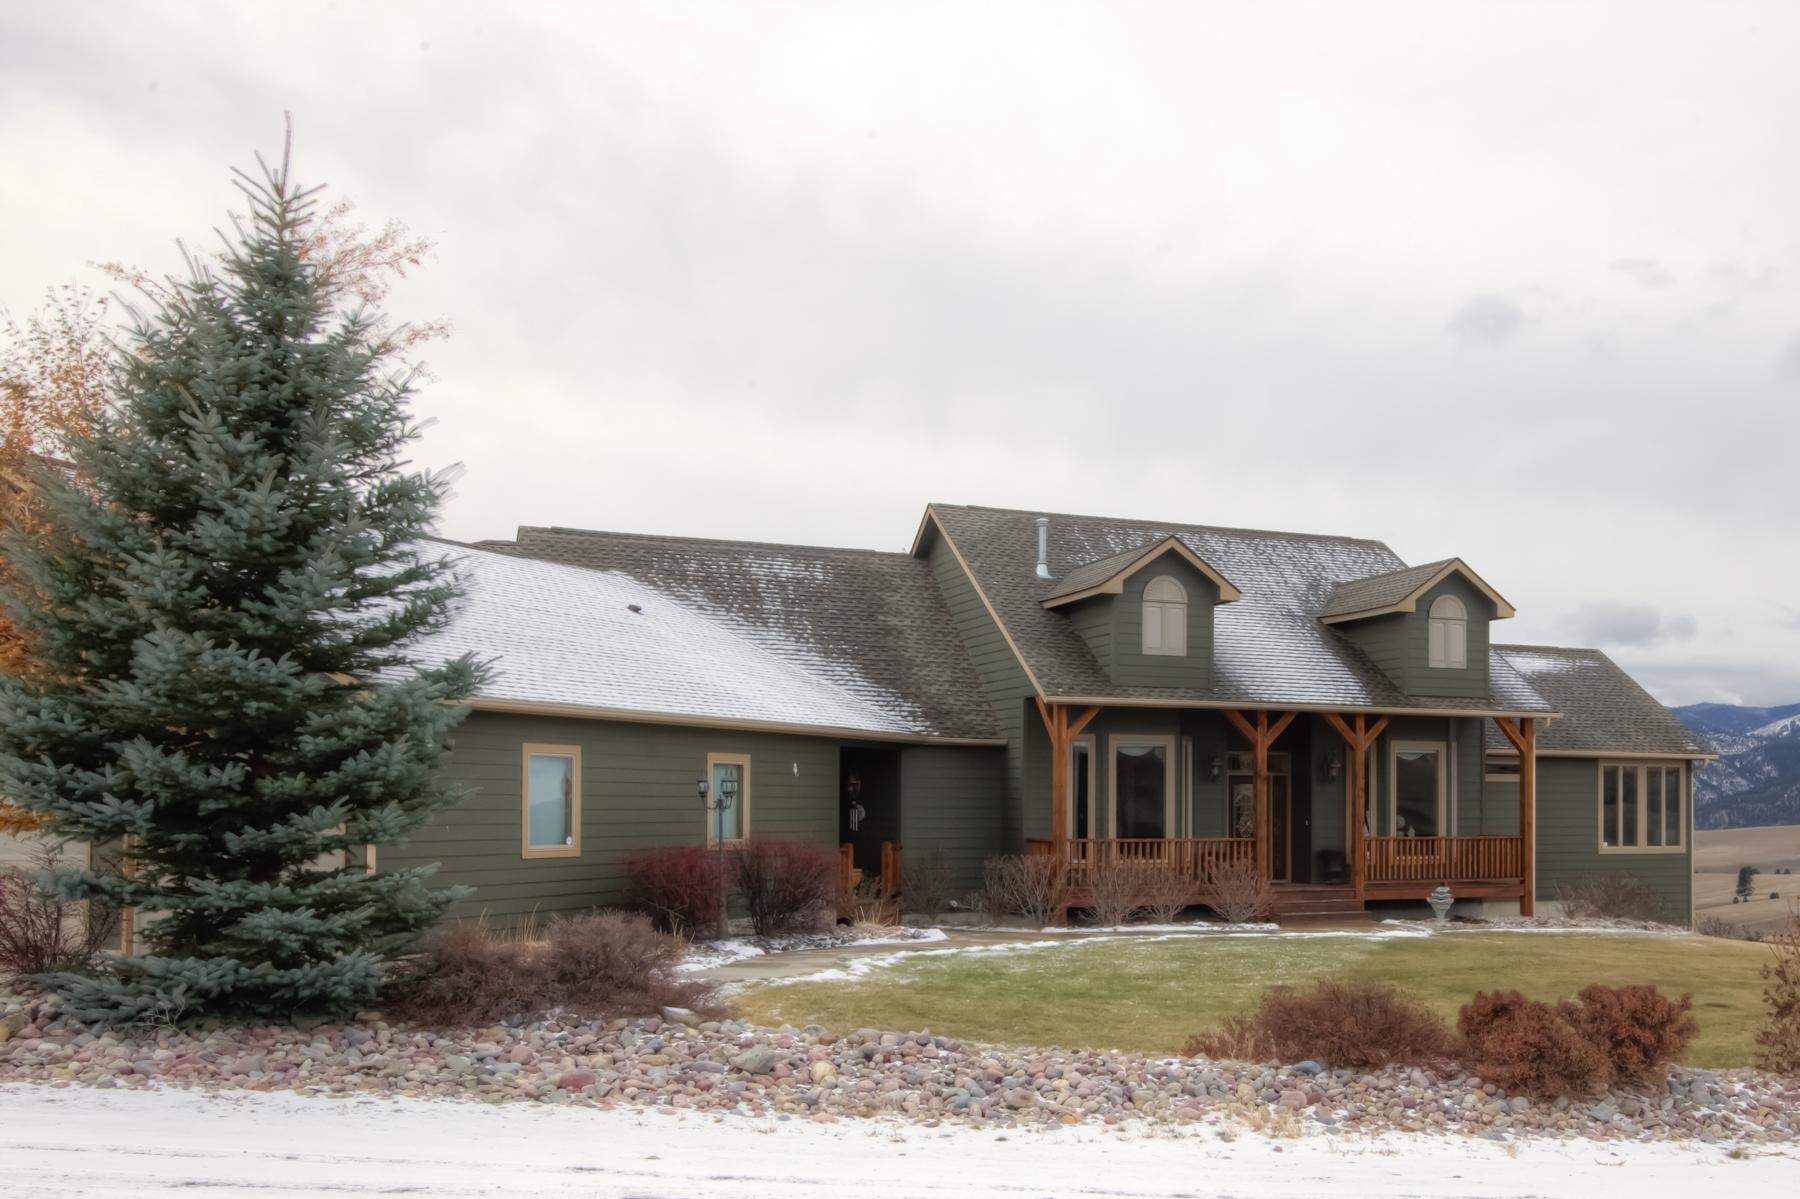 Villa per Vendita alle ore 3105 Evans Ridge Road Missoula, Montana 59803 Stati Uniti